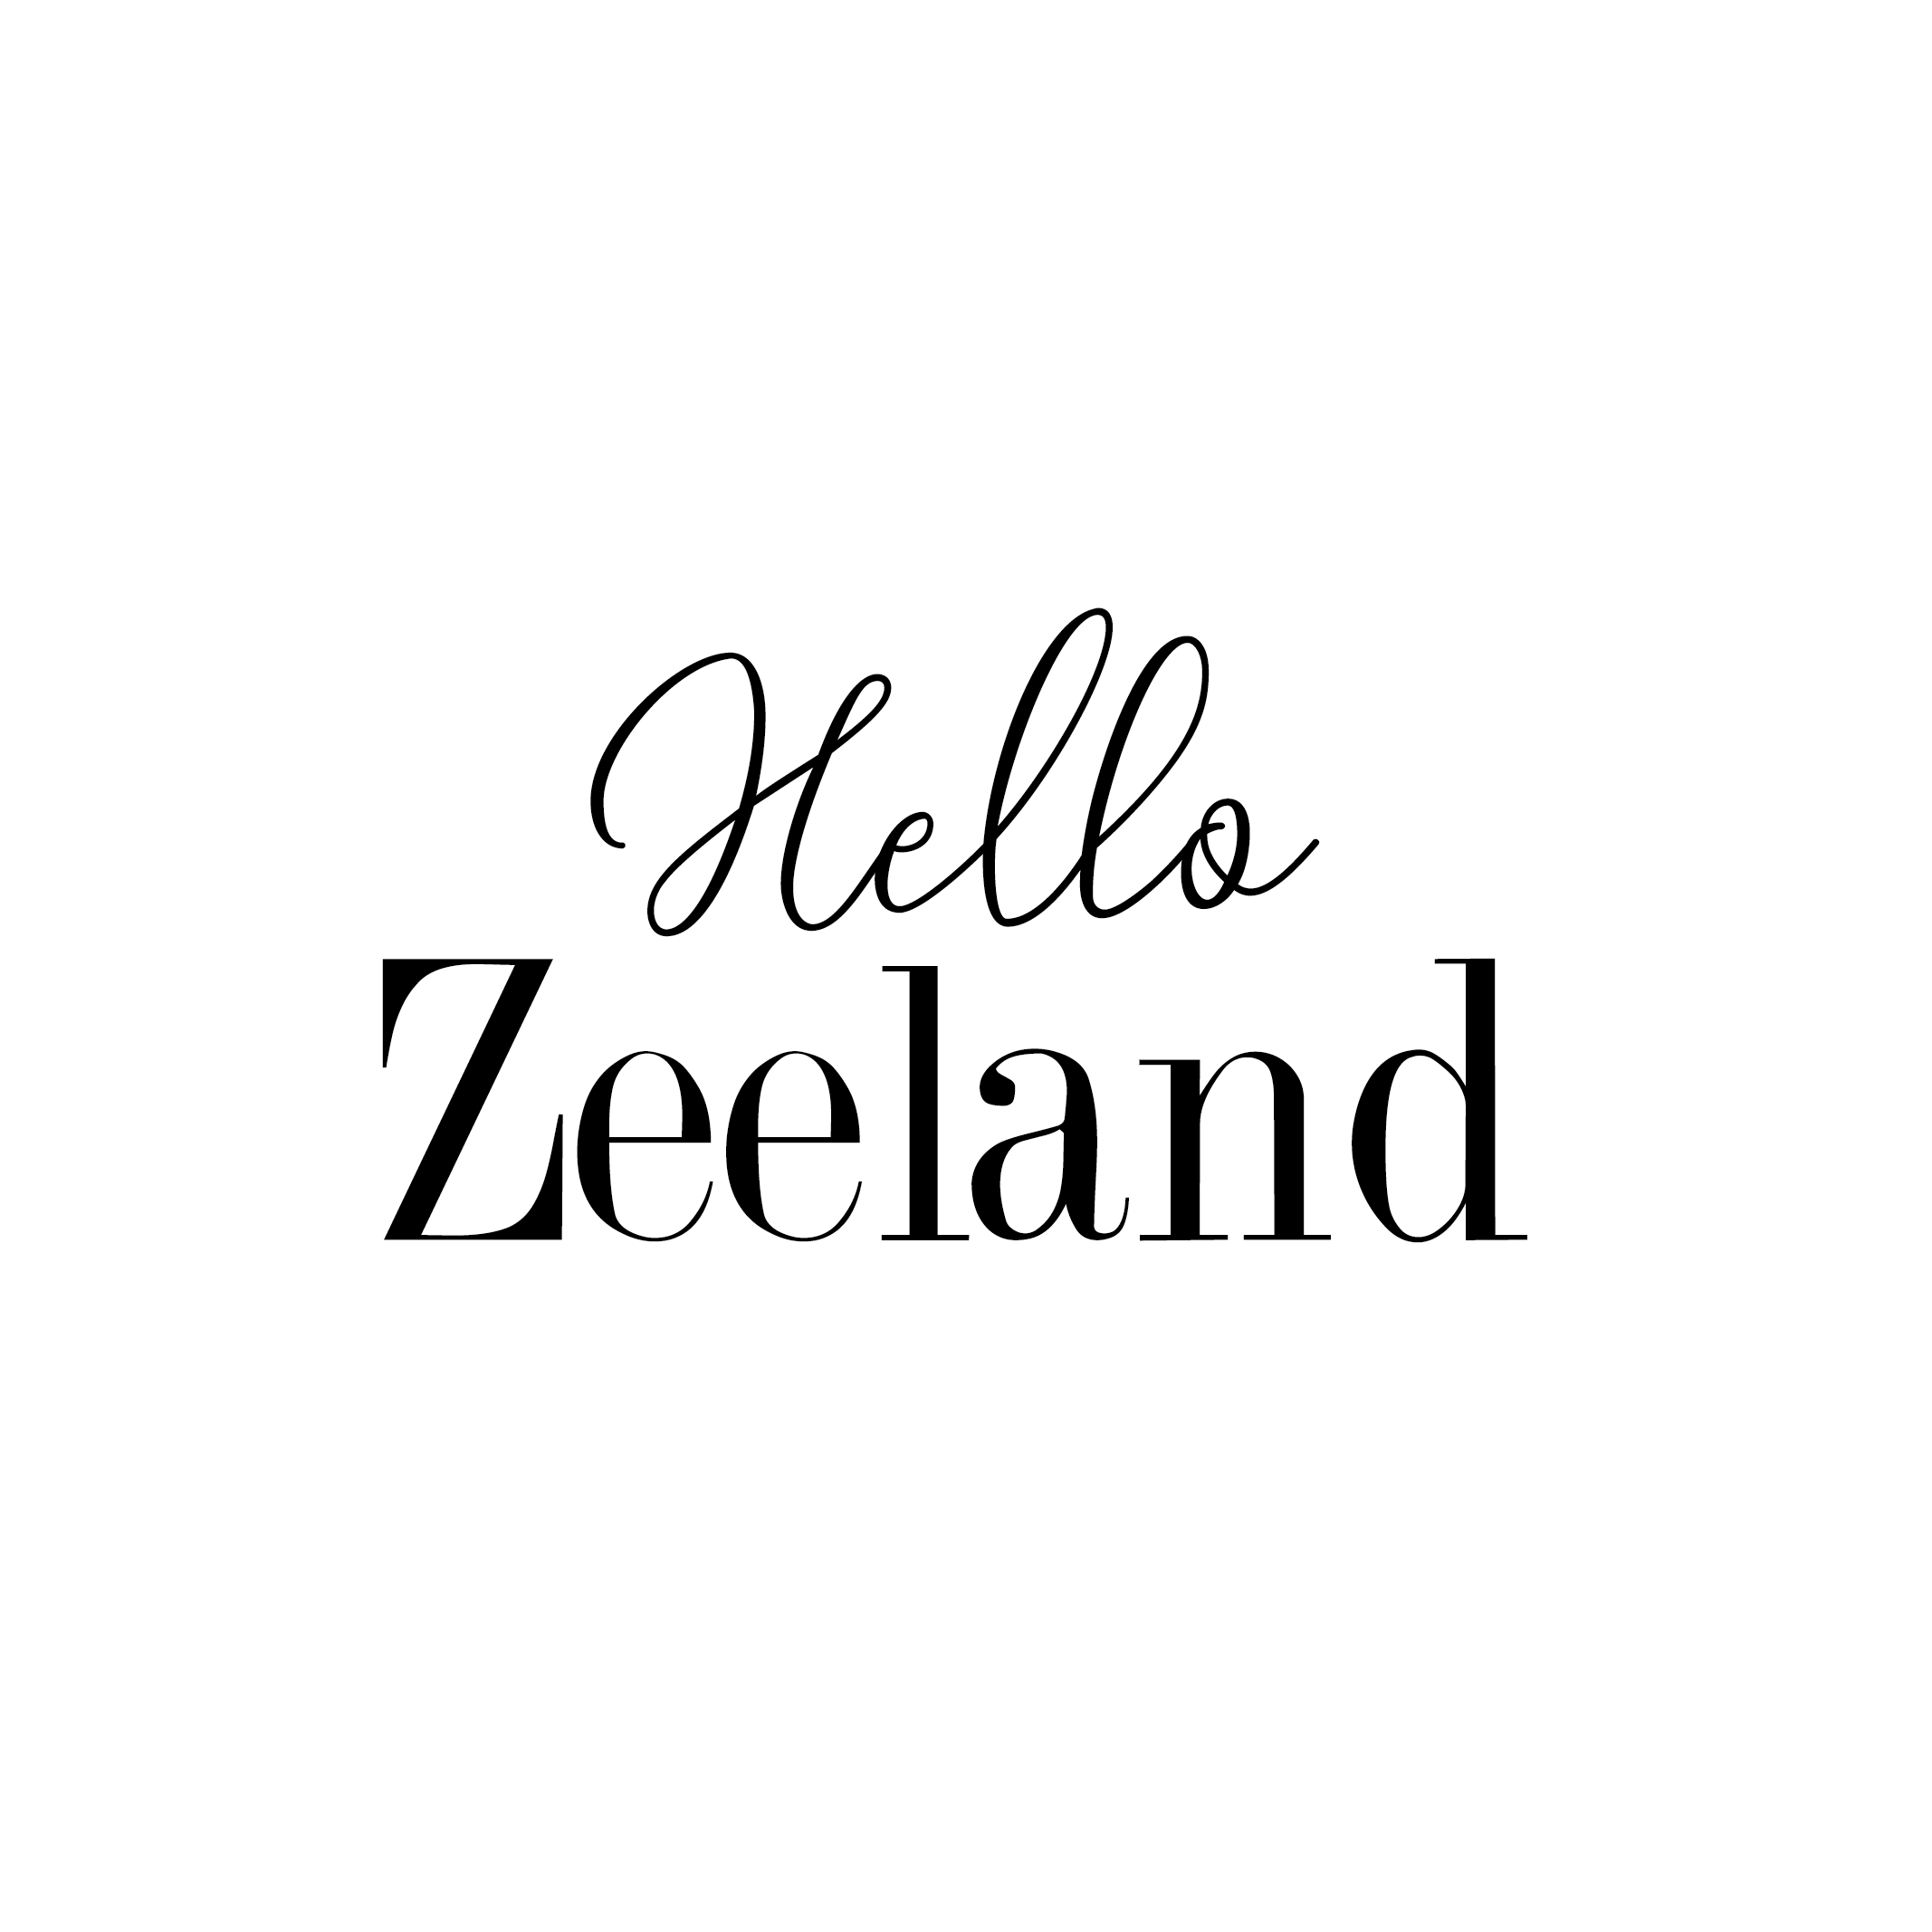 Hello Zeeland